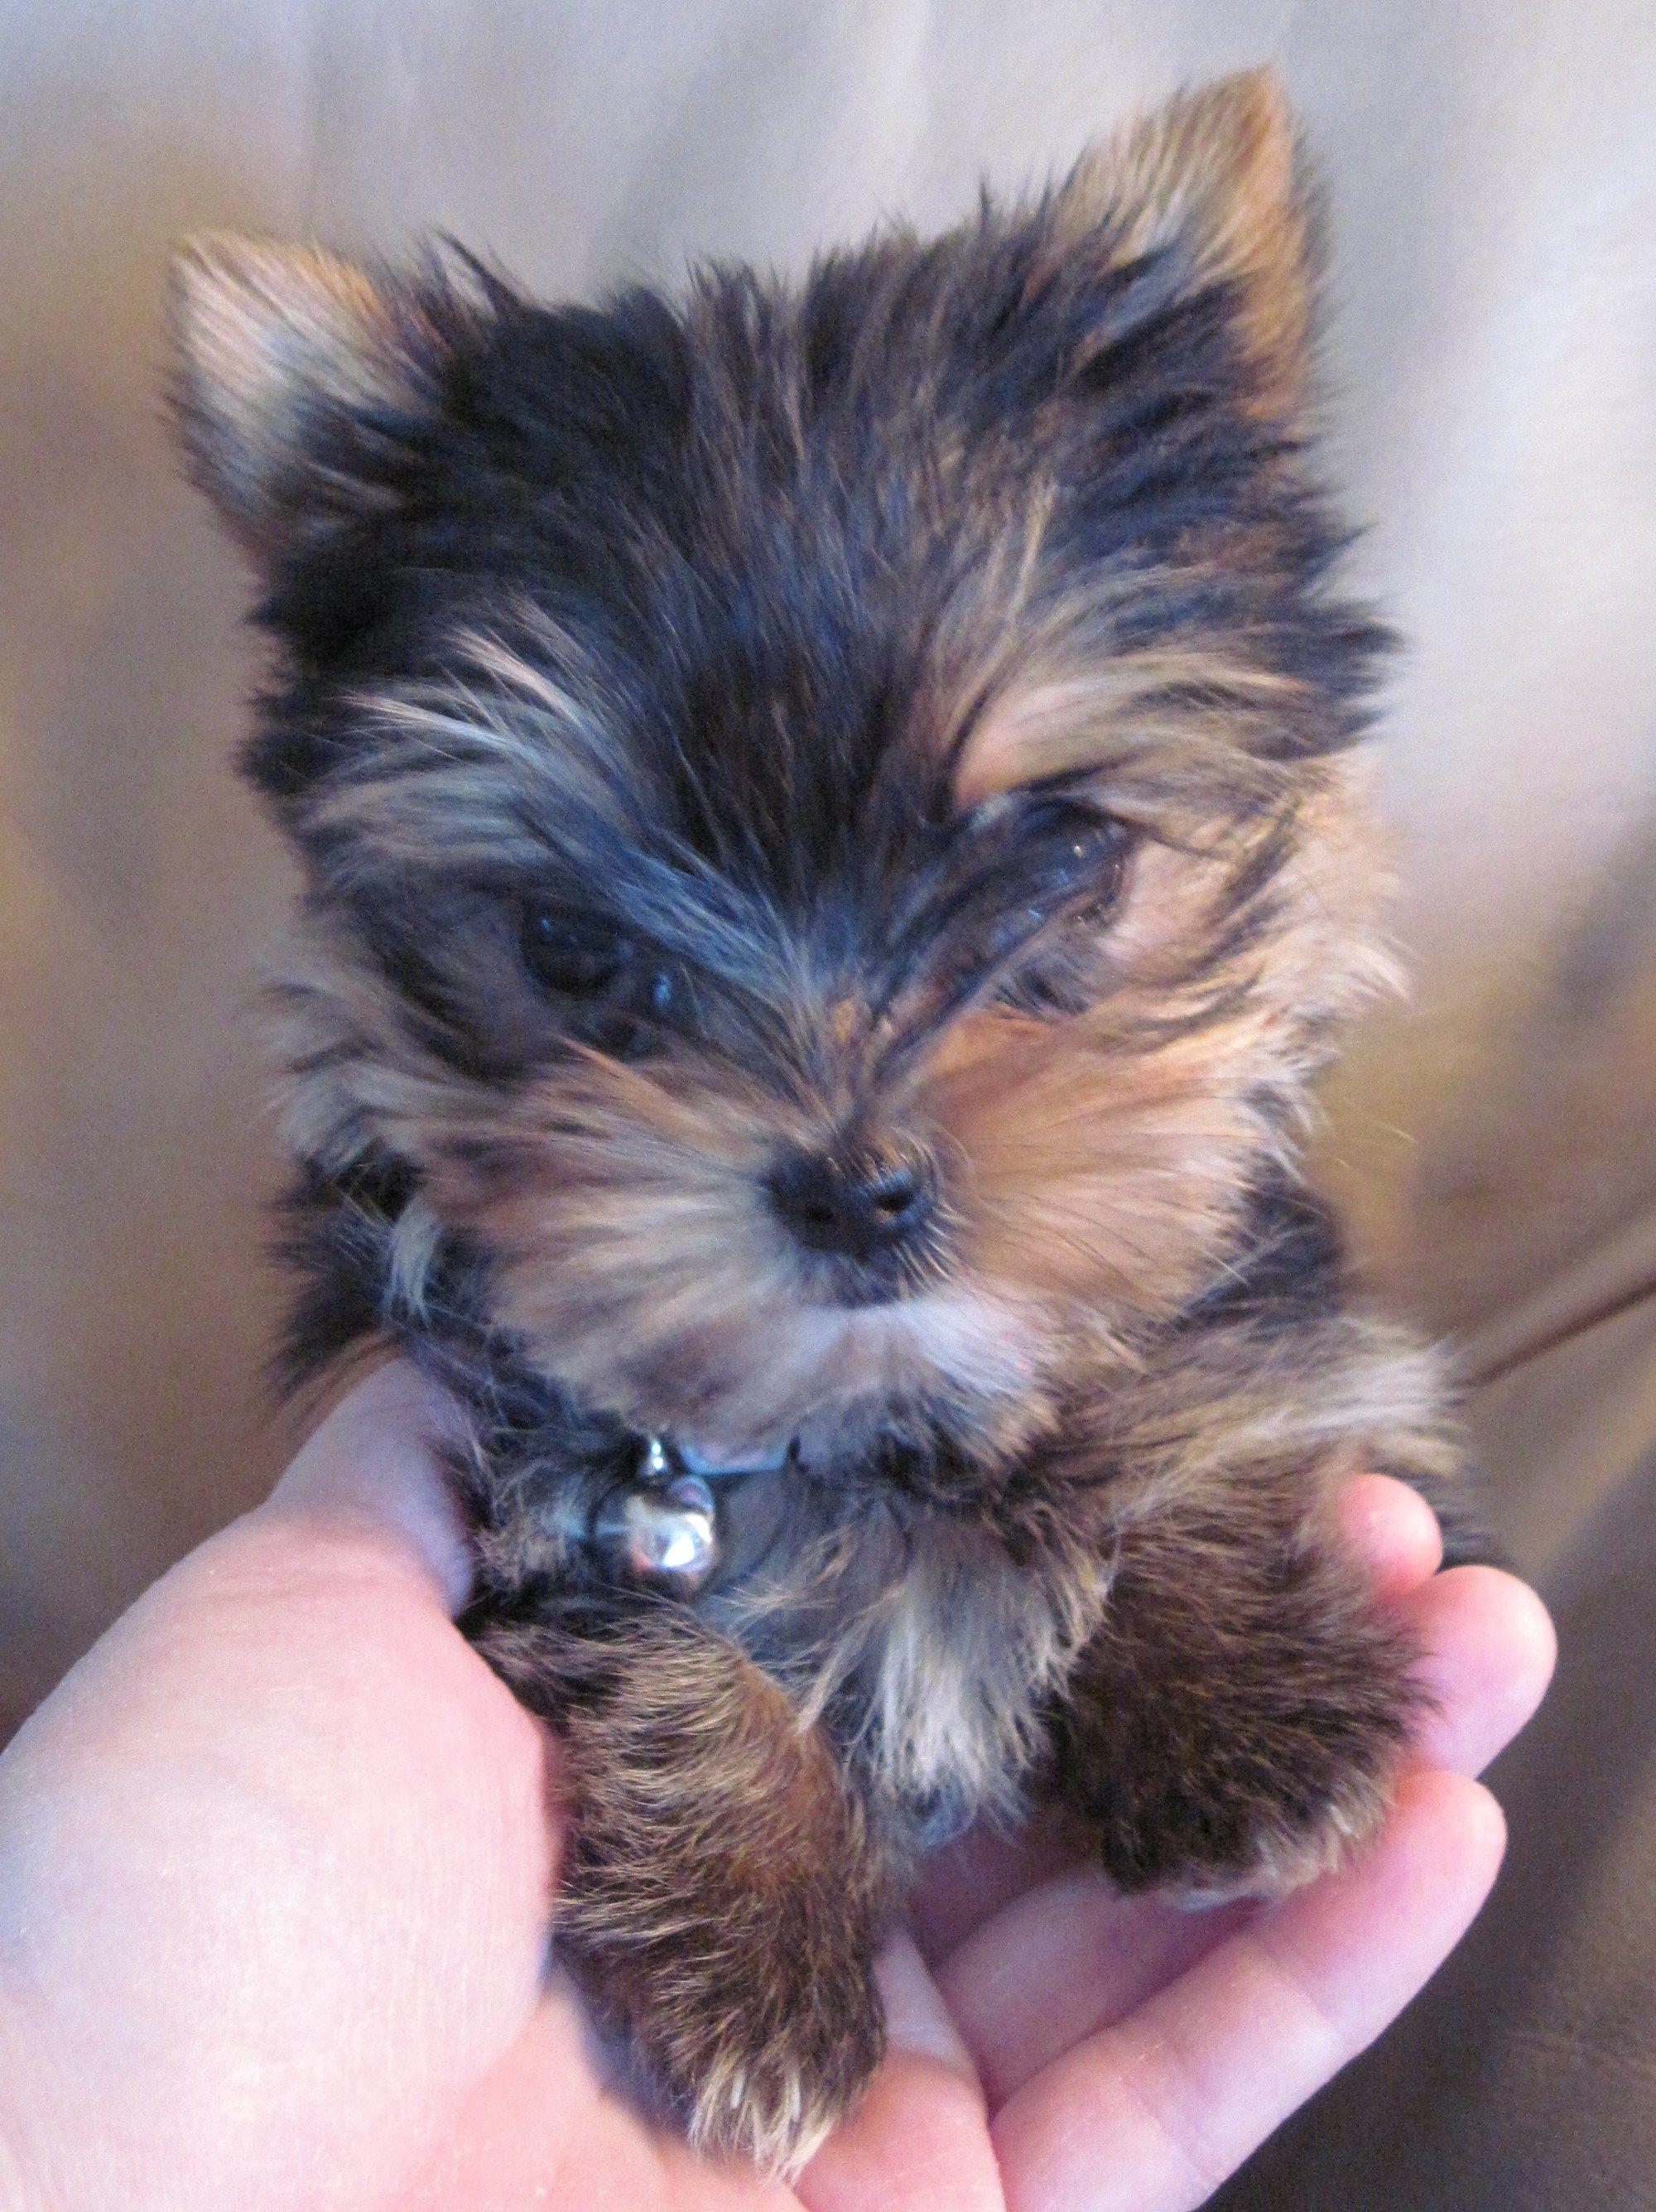 Omg So Adorable Looks Like A Stuffy Yorkshire Terrier Dog Yorkie Puppy Yorkshire Terrier Puppies